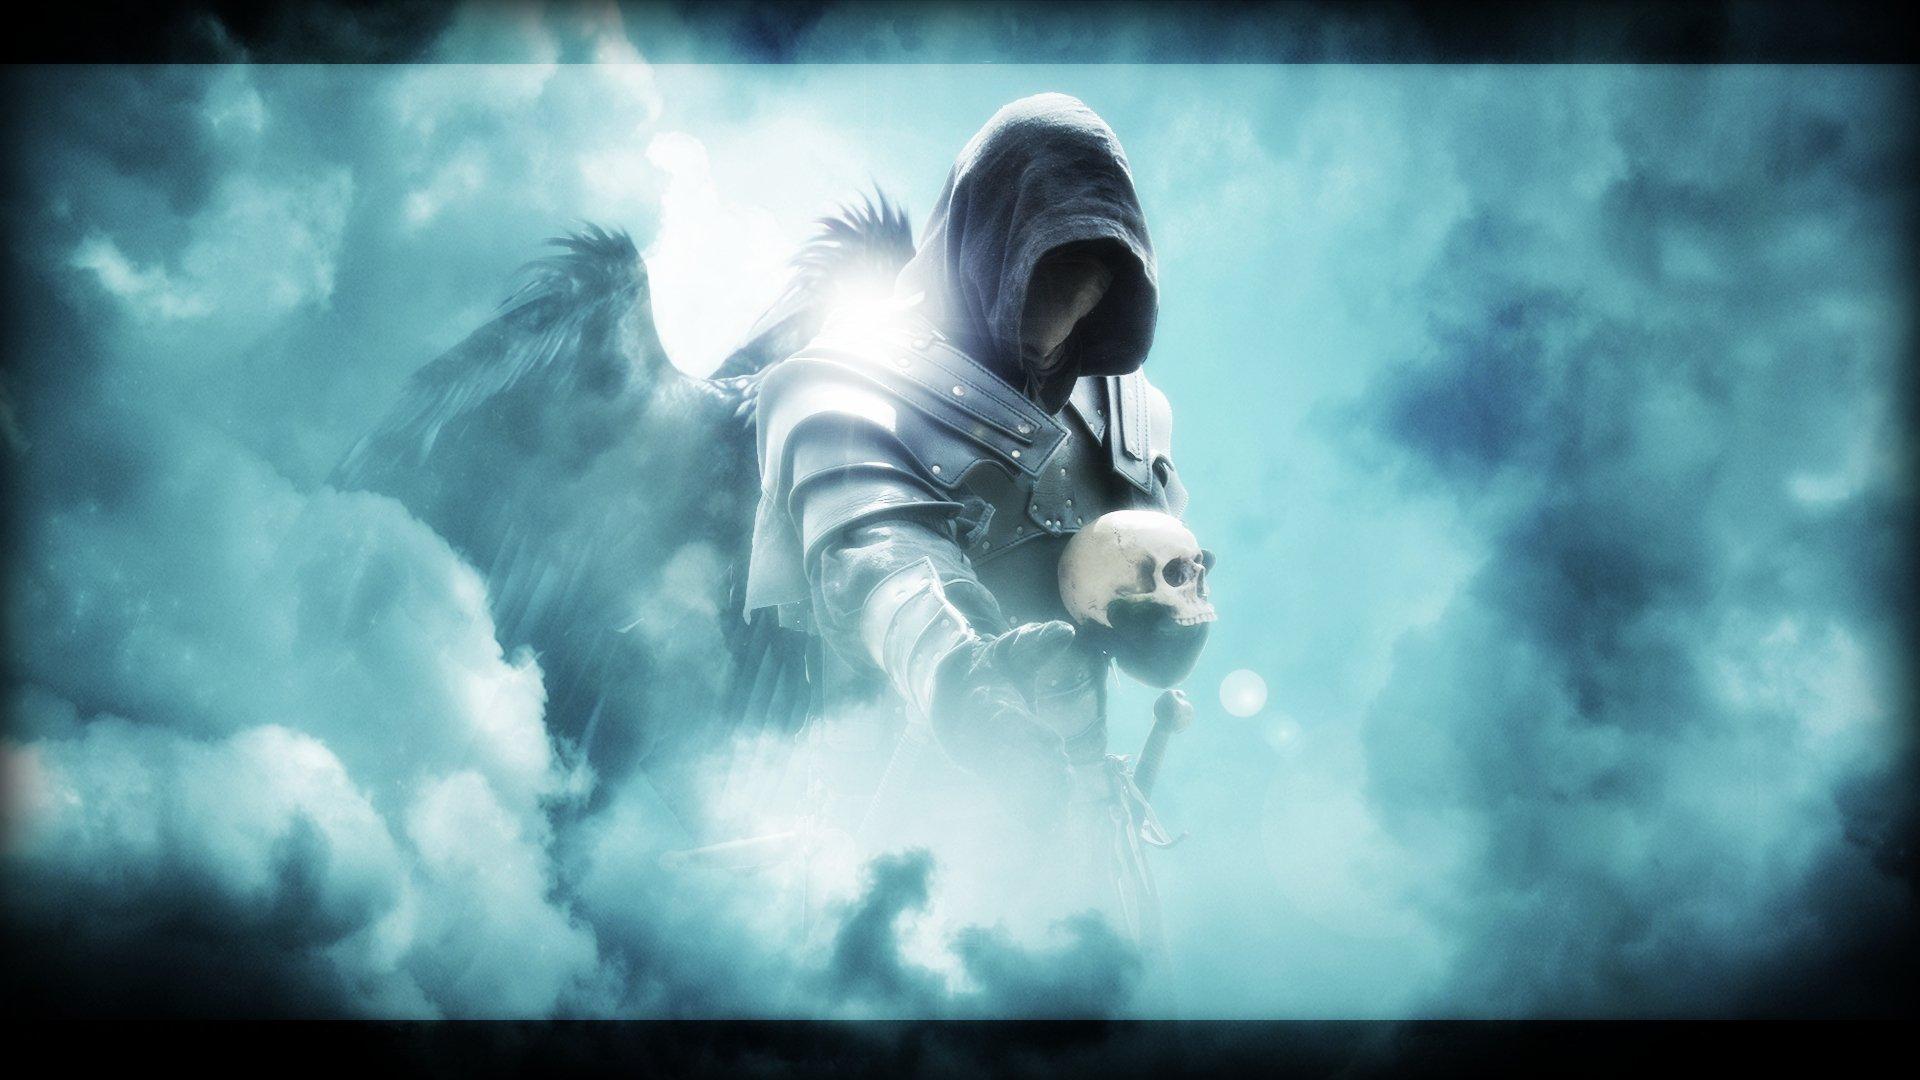 Archangel Michael Hd Wallpaper Ezio Auditore Death Angel Full Hd Wallpaper And